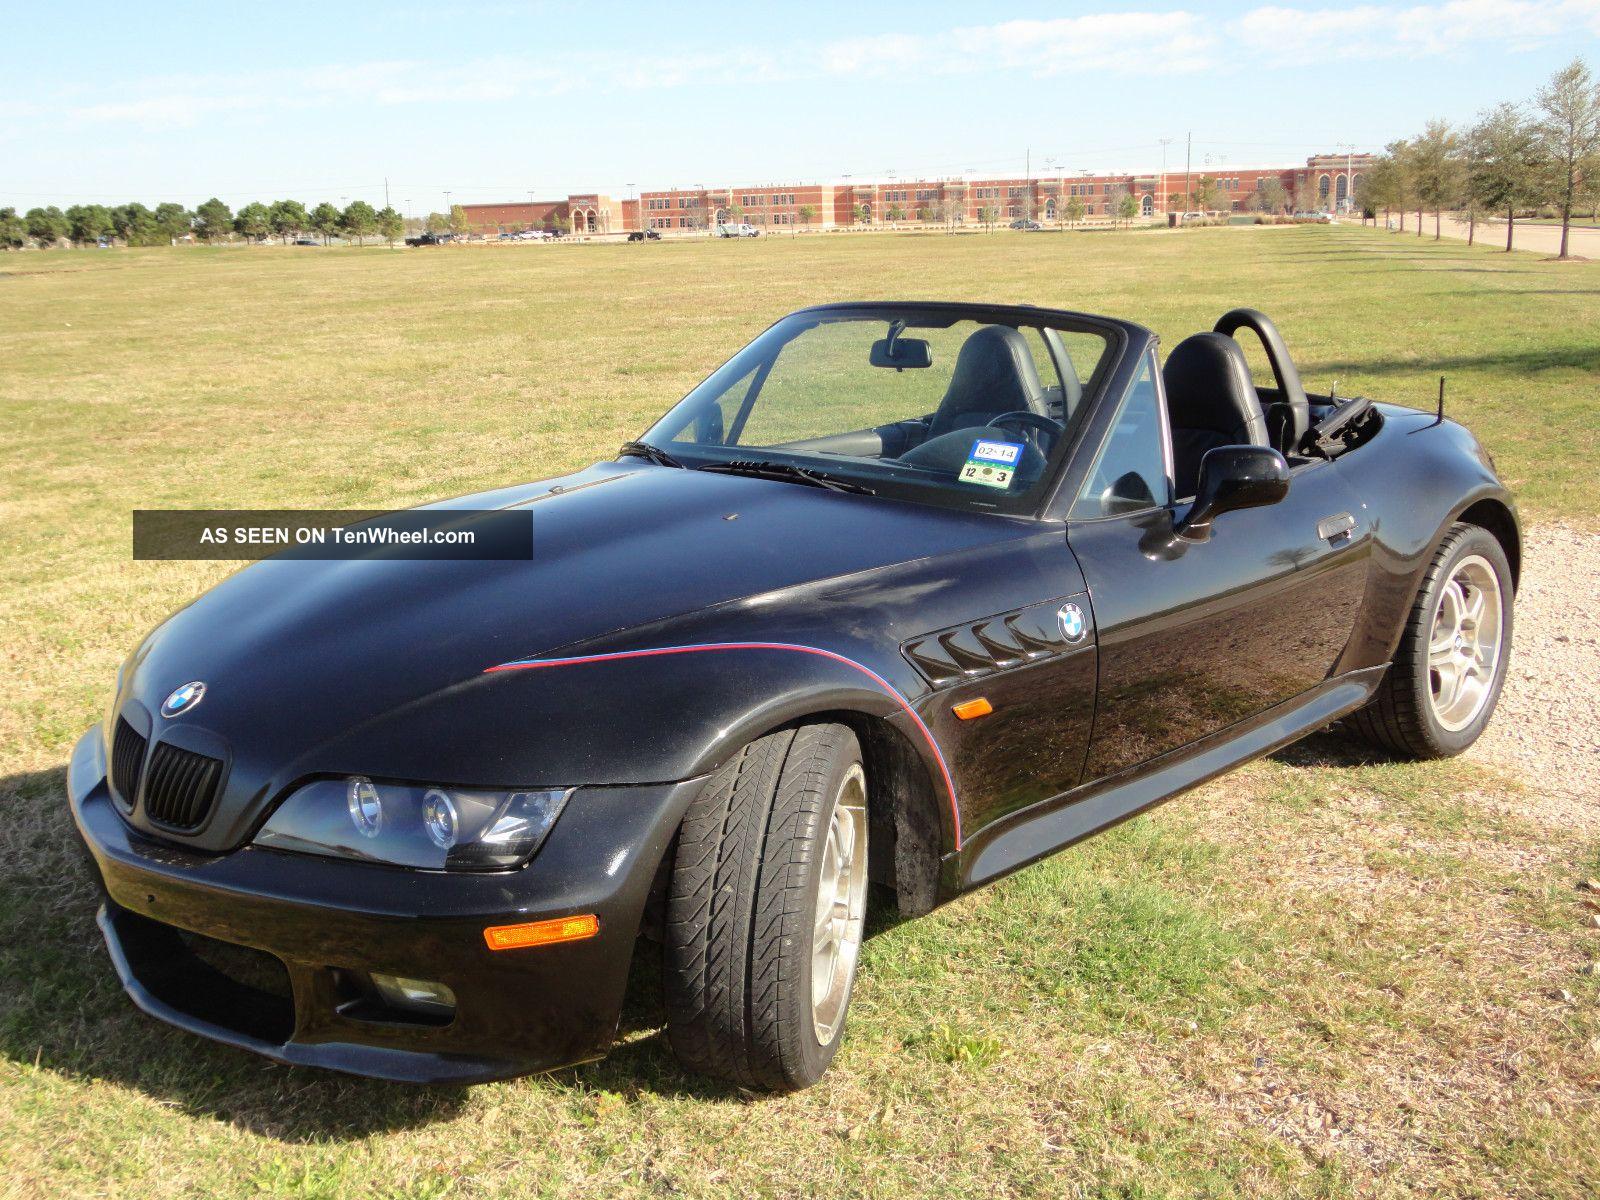 1999 Bmw Z3 Black Manual 5 Speed 6cyl 2 8l Roadster